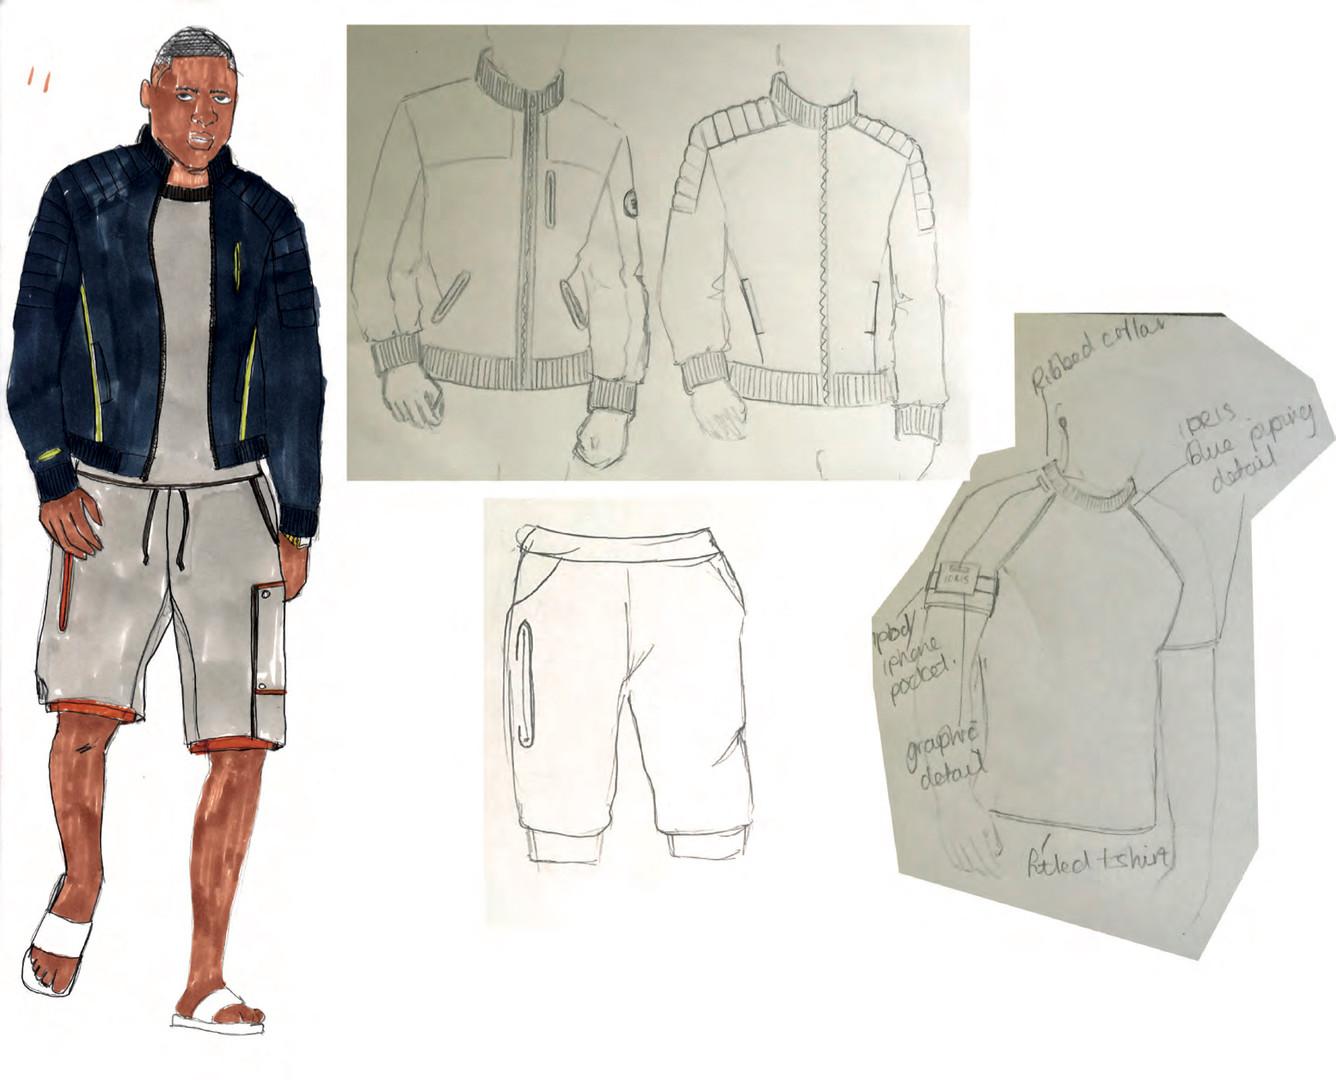 SD x IE - Outfit 6 design development